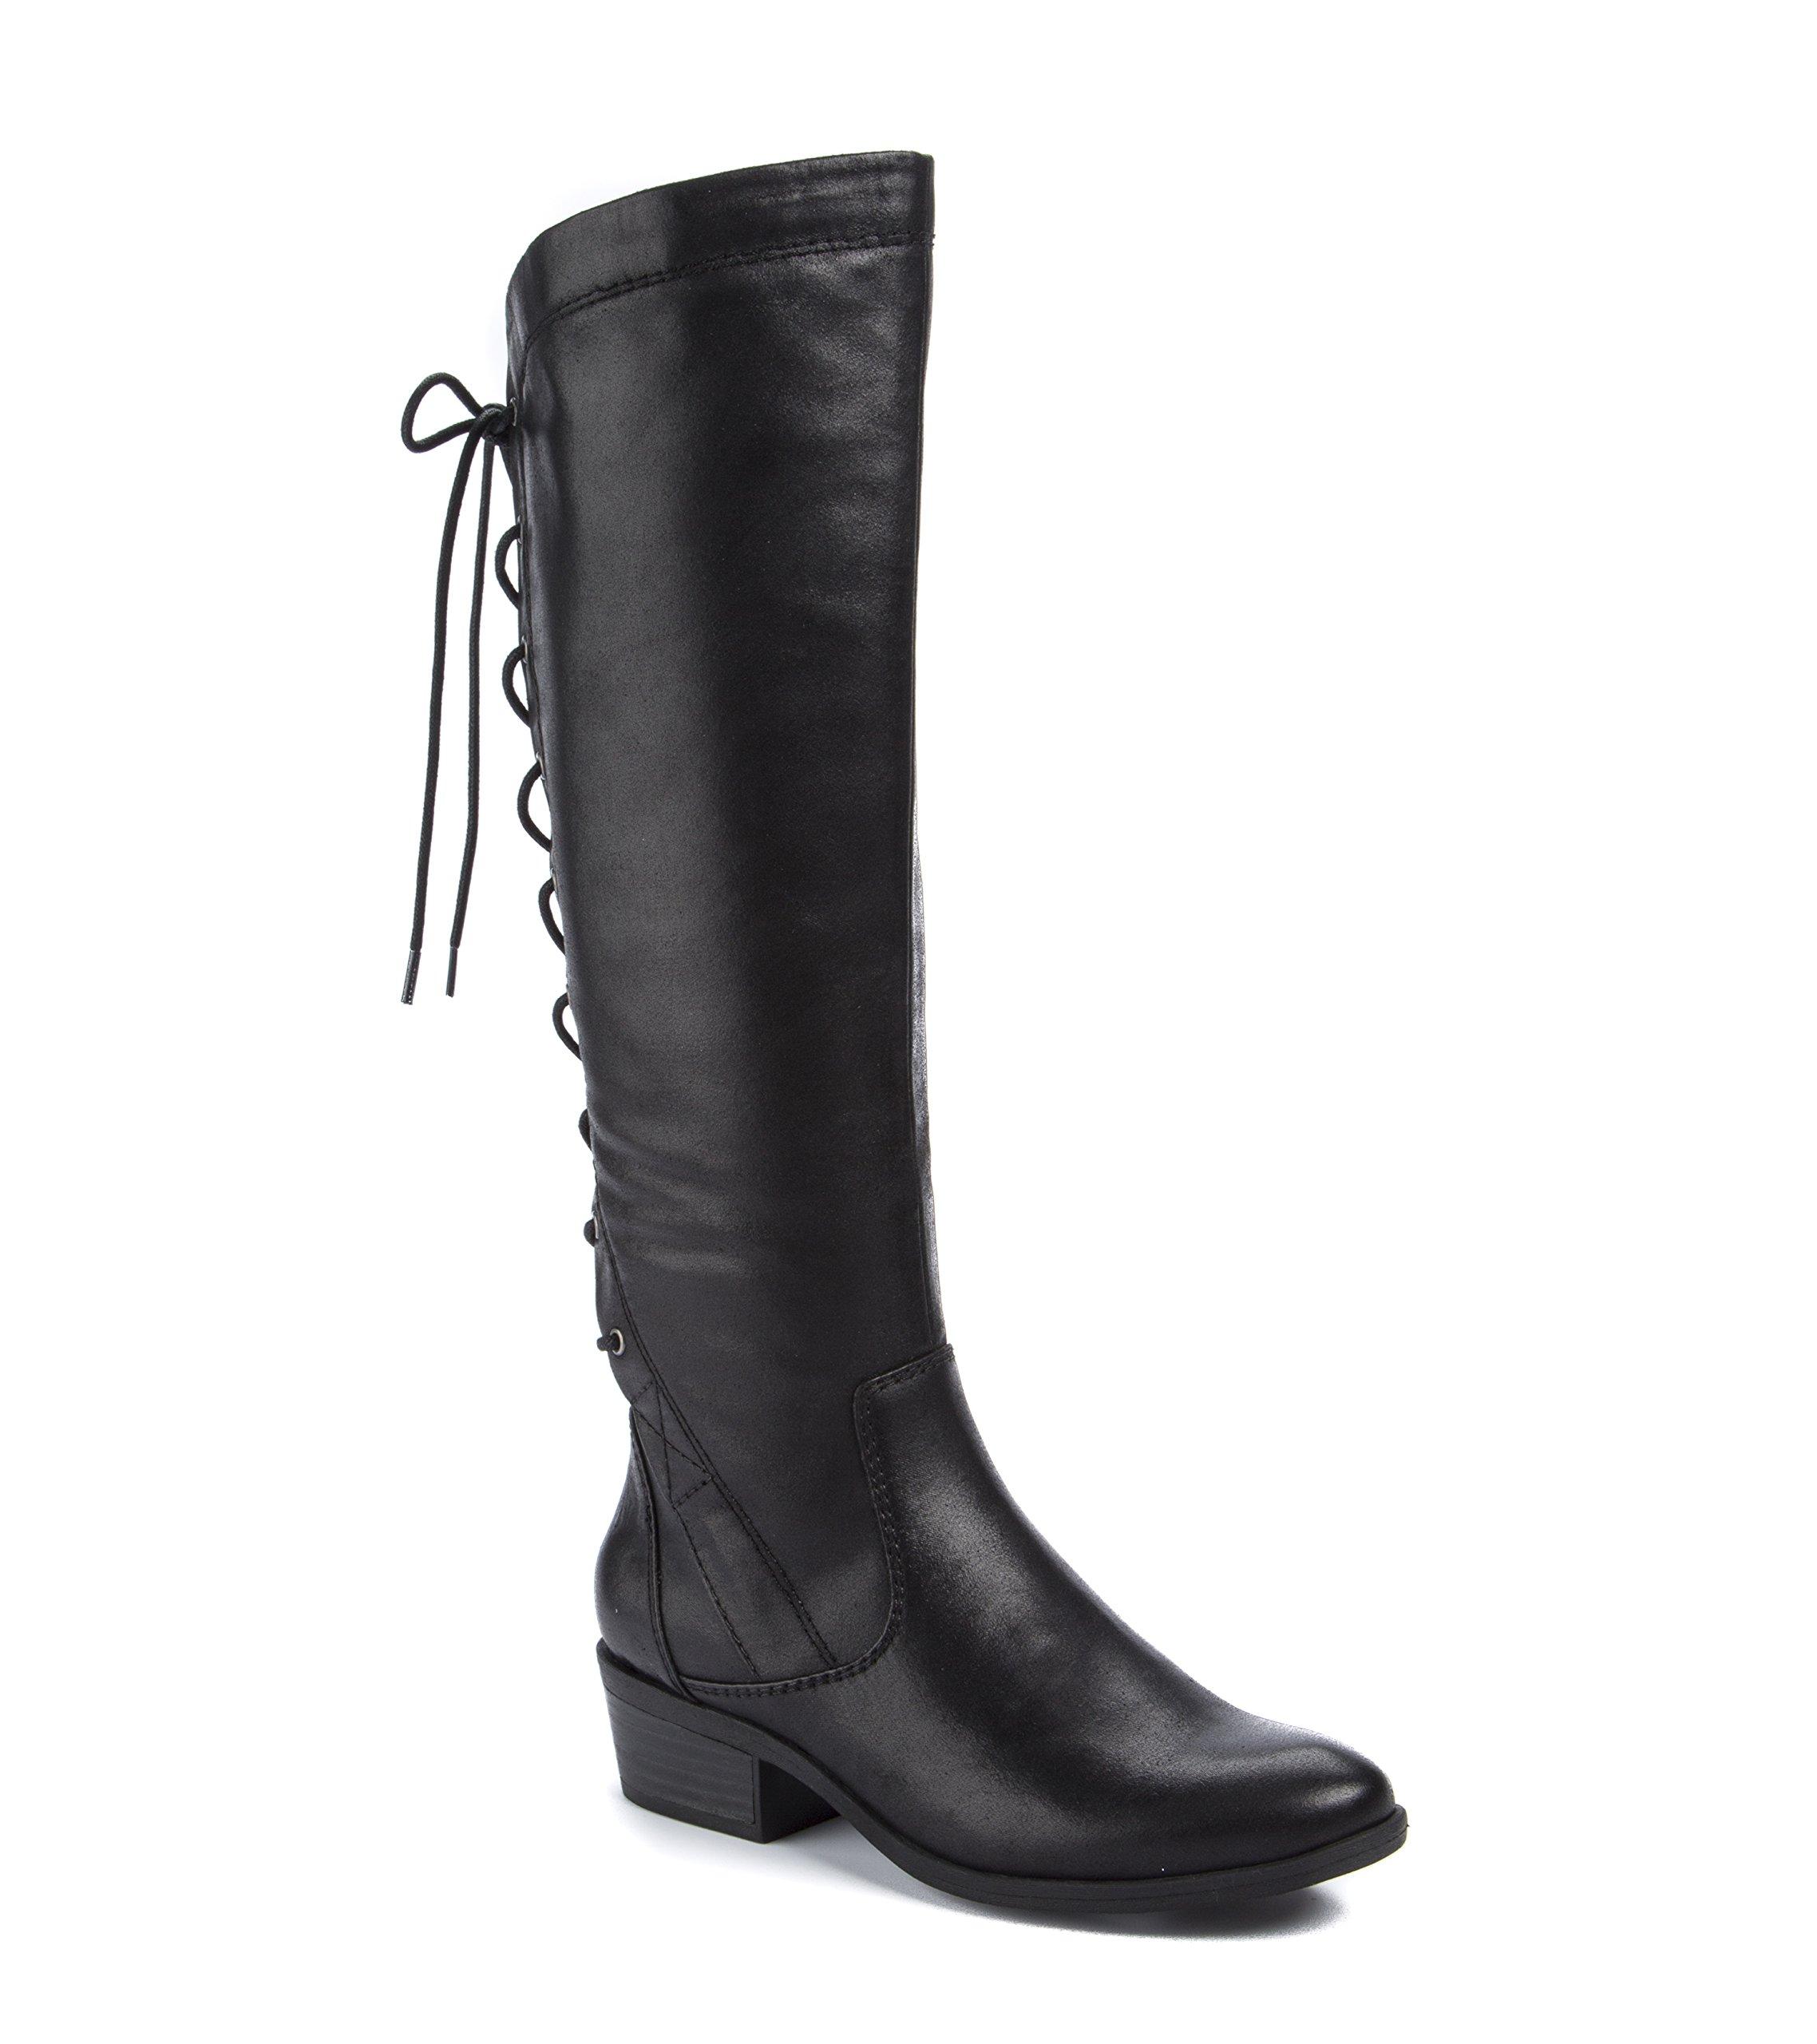 BareTraps Women's Bt Gardyna Riding Boot, Black, 8 US/8 M US